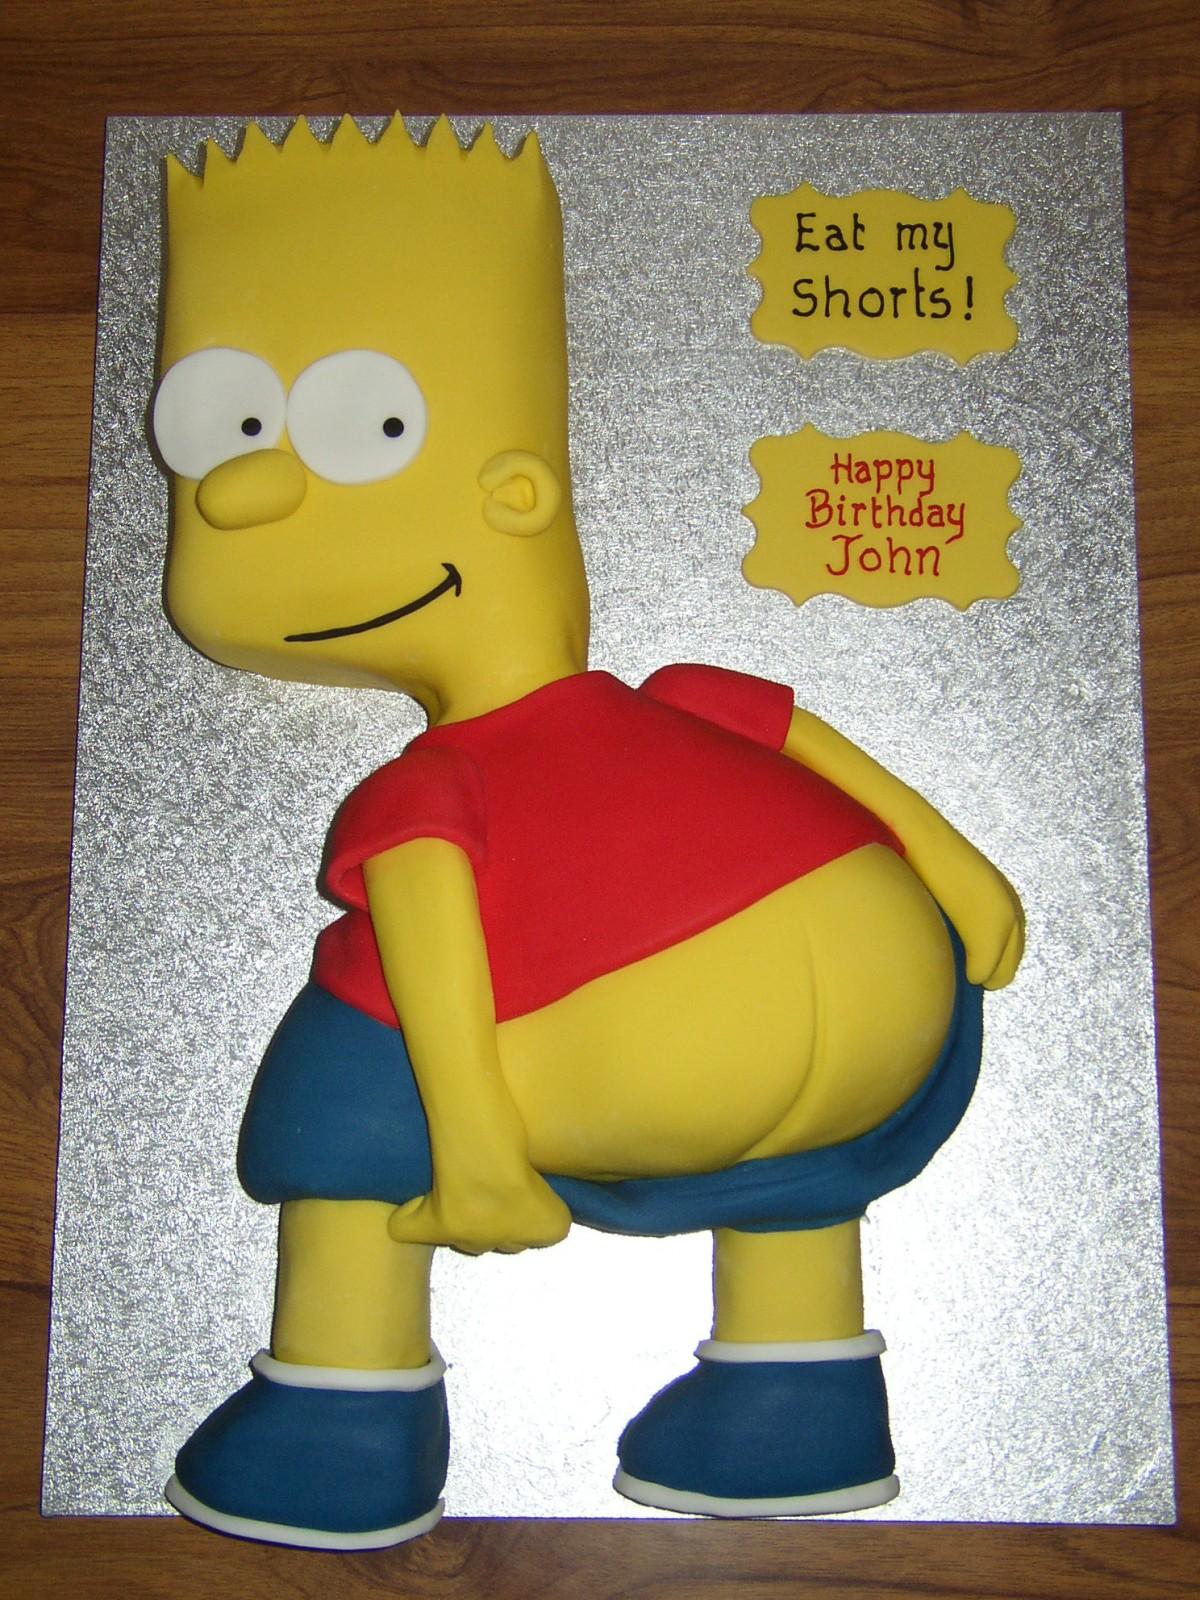 Enjoyable Bart Simpson Inspired Birthday Cake Susies Cakes Personalised Birthday Cards Veneteletsinfo